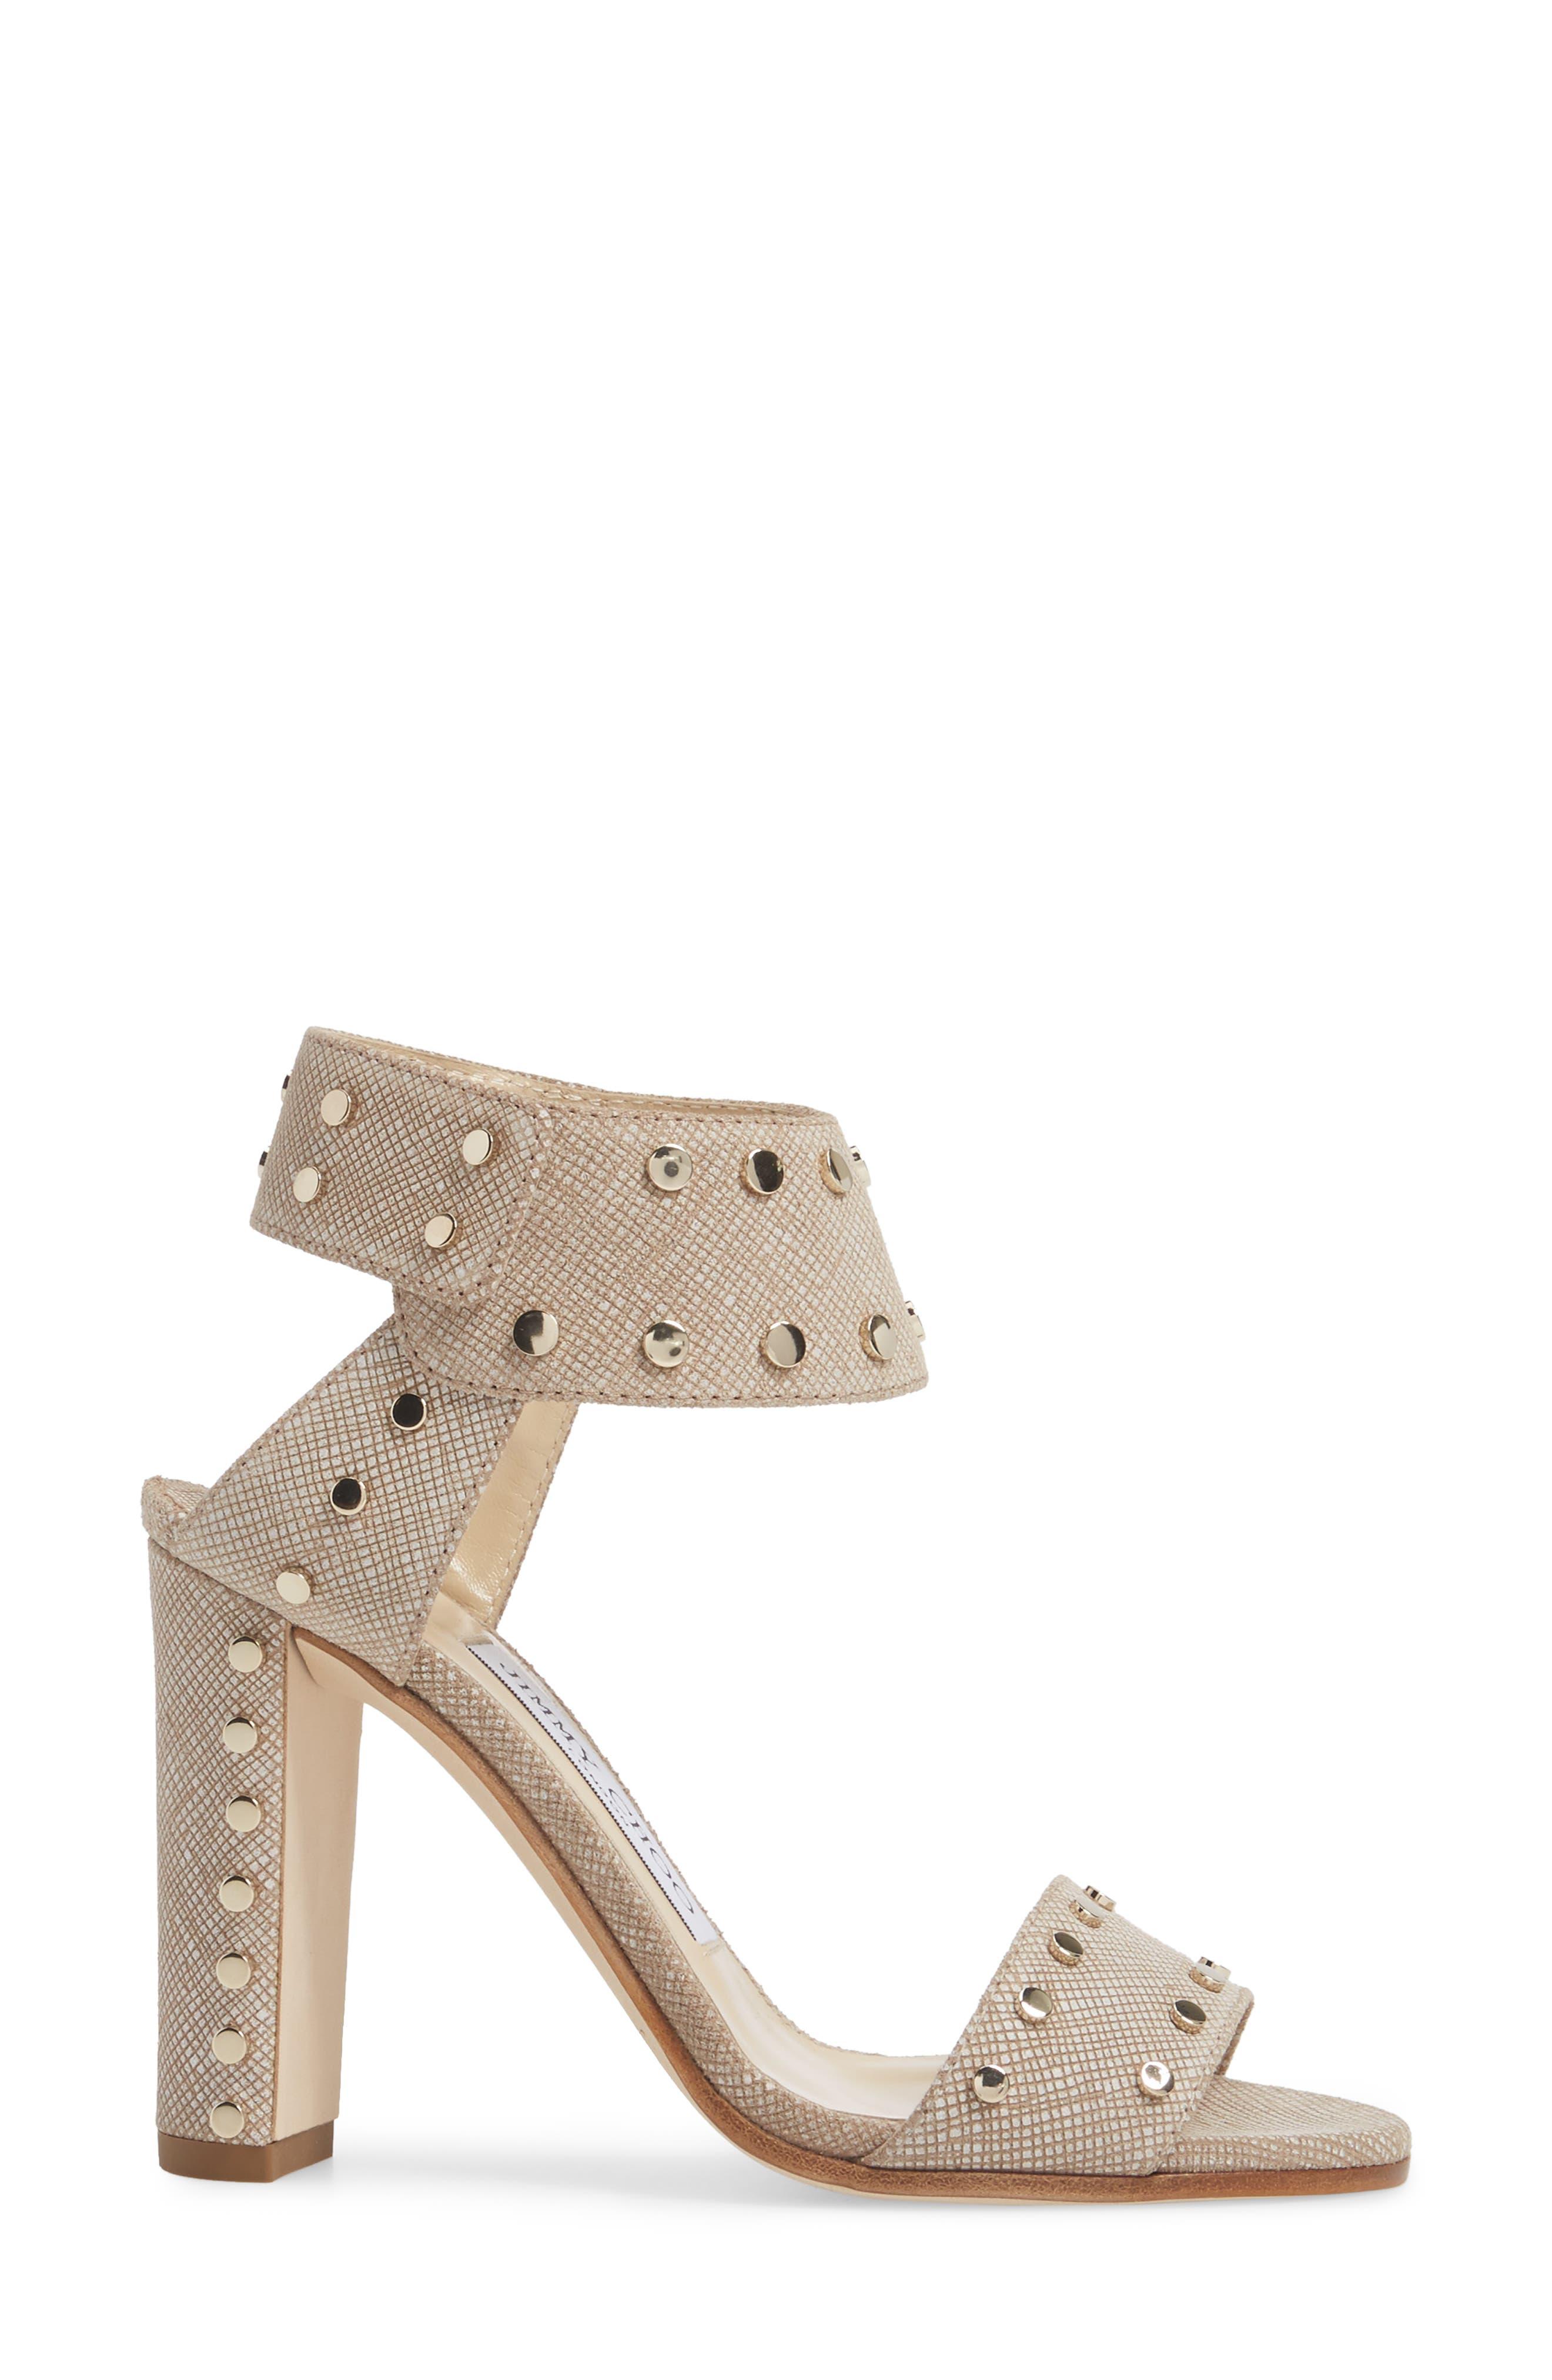 Alternate Image 3  - Jimmy Choo Veto Studded Ankle Cuff Sandal (Women)